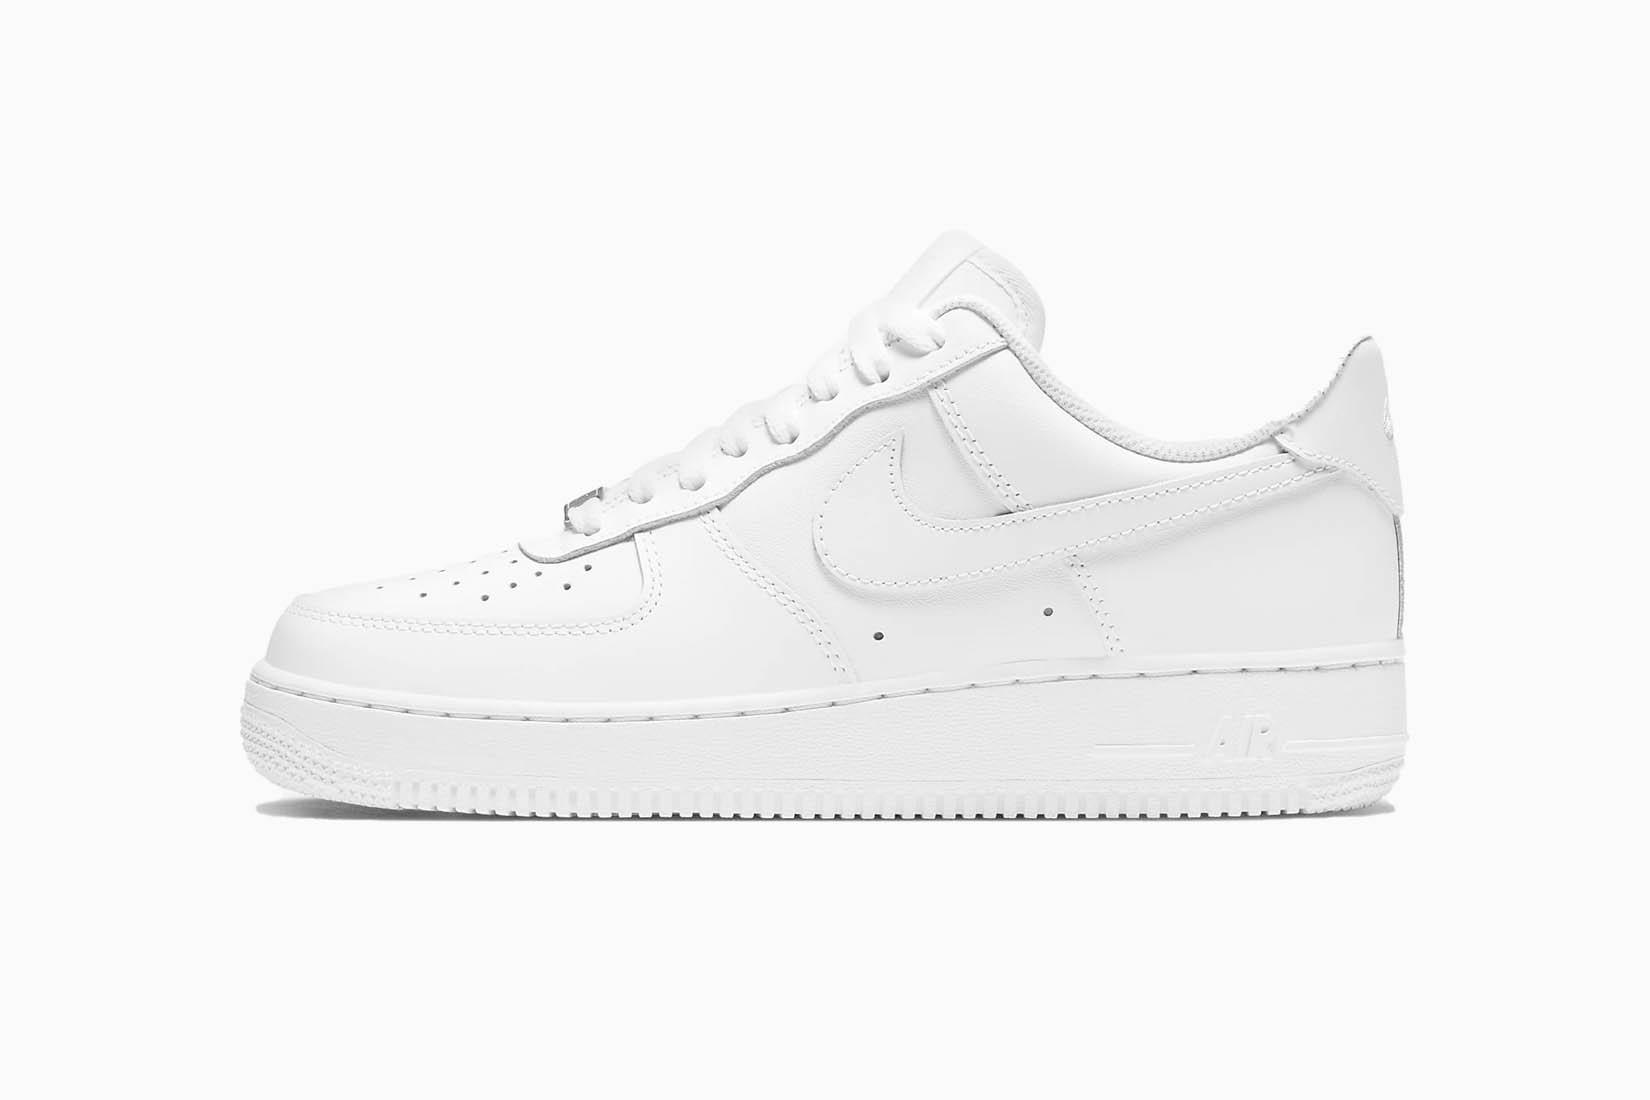 best sneakers women nike air force review Luxe Digital